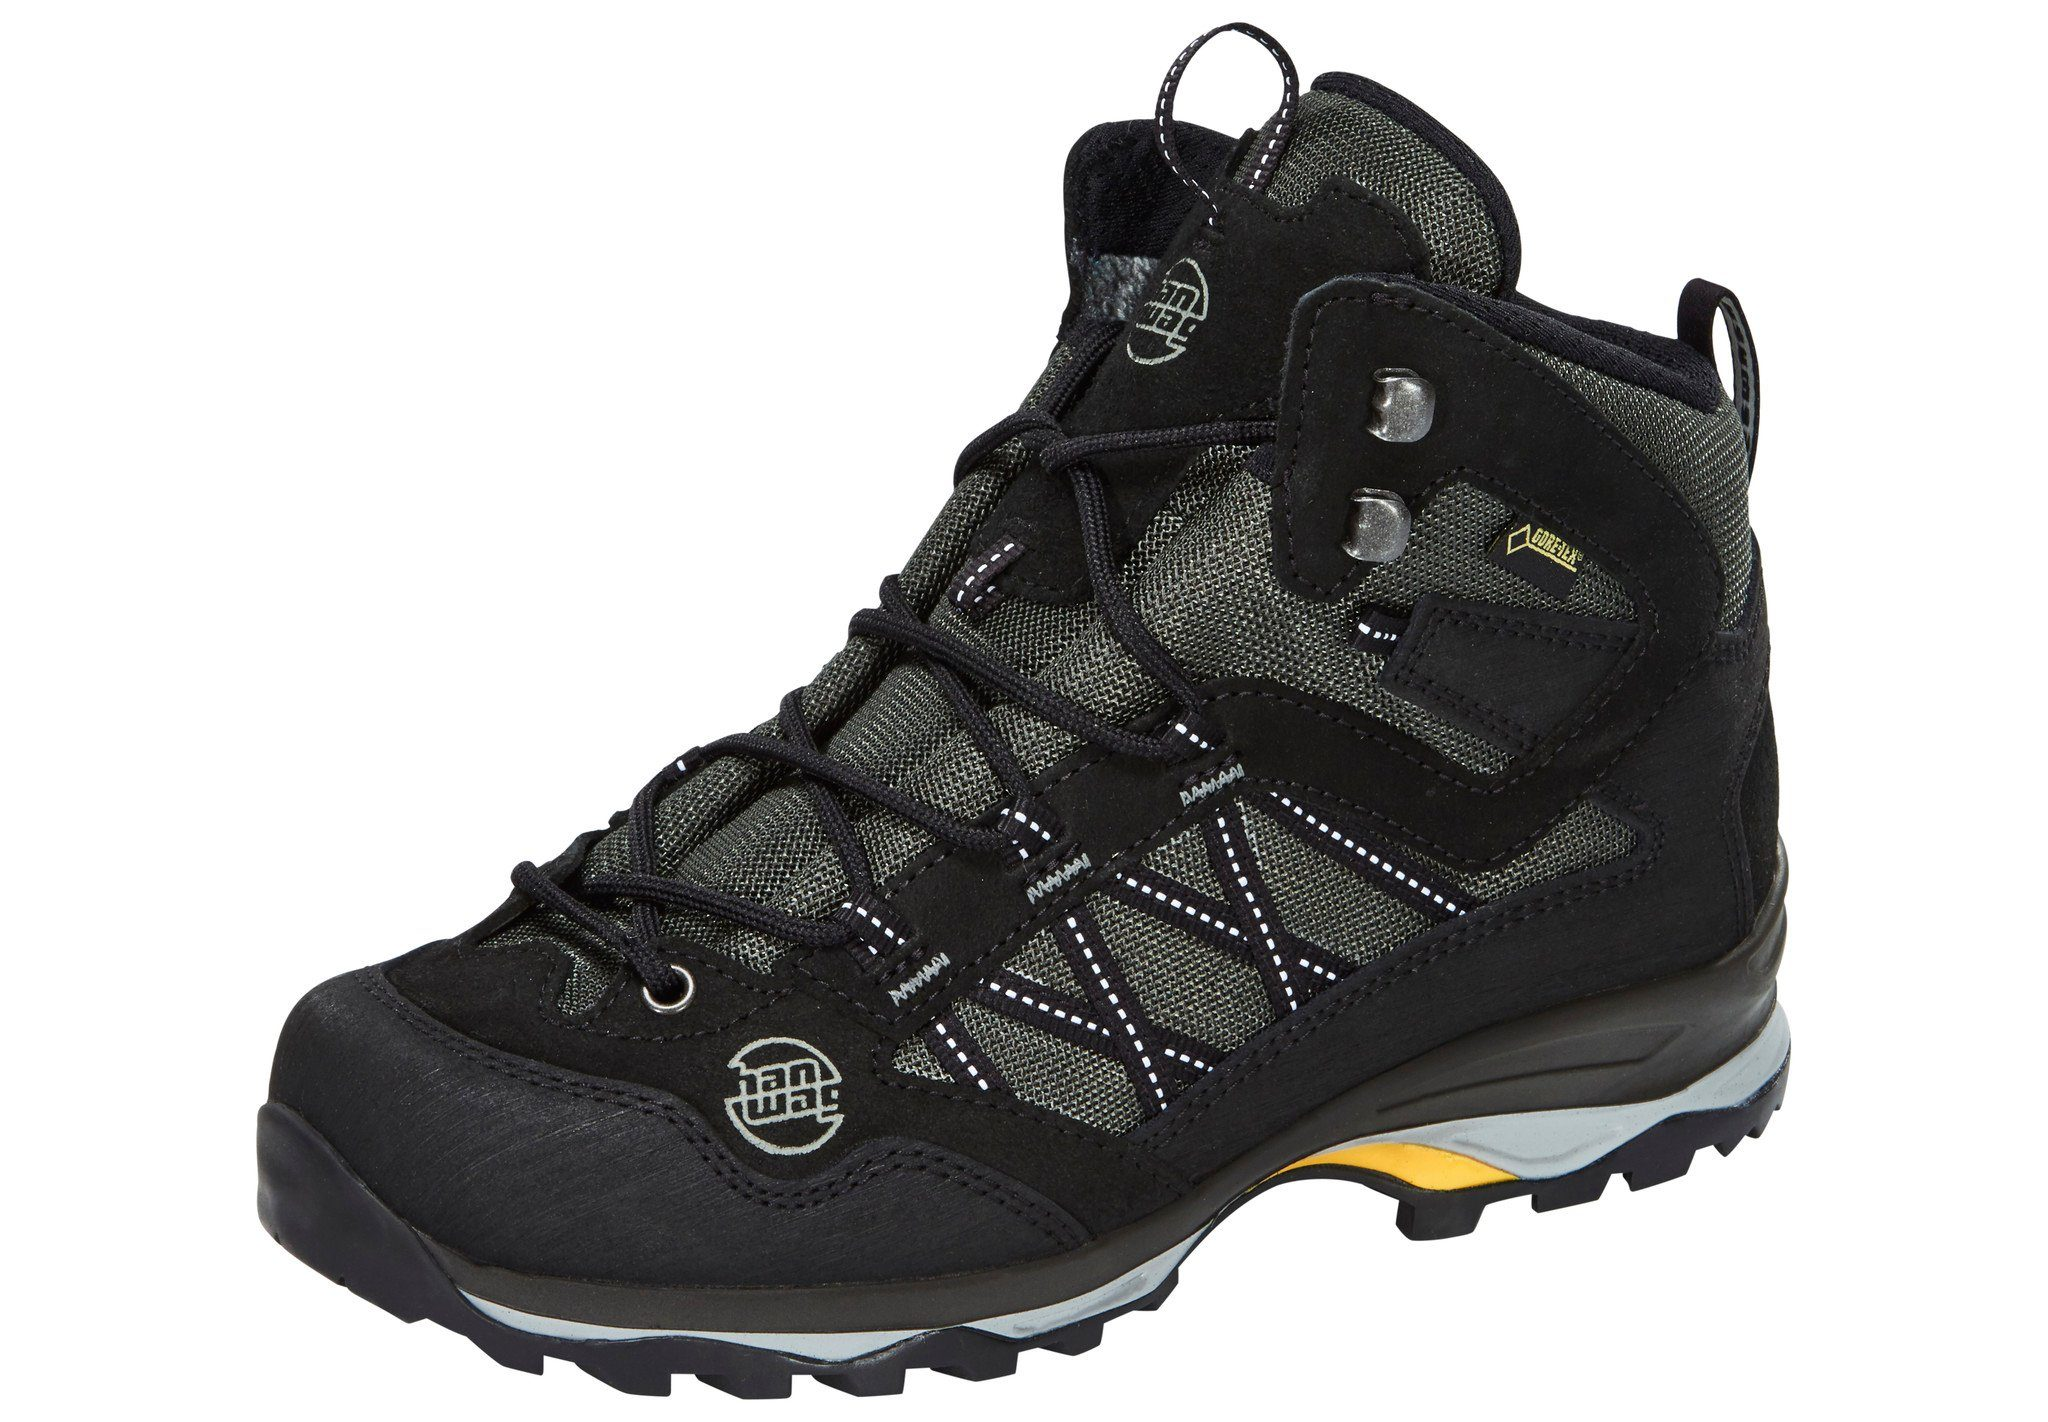 Hanwag Kletterschuh »Belorado Mid Bunion Lady GTX Trekking Shoes Women«